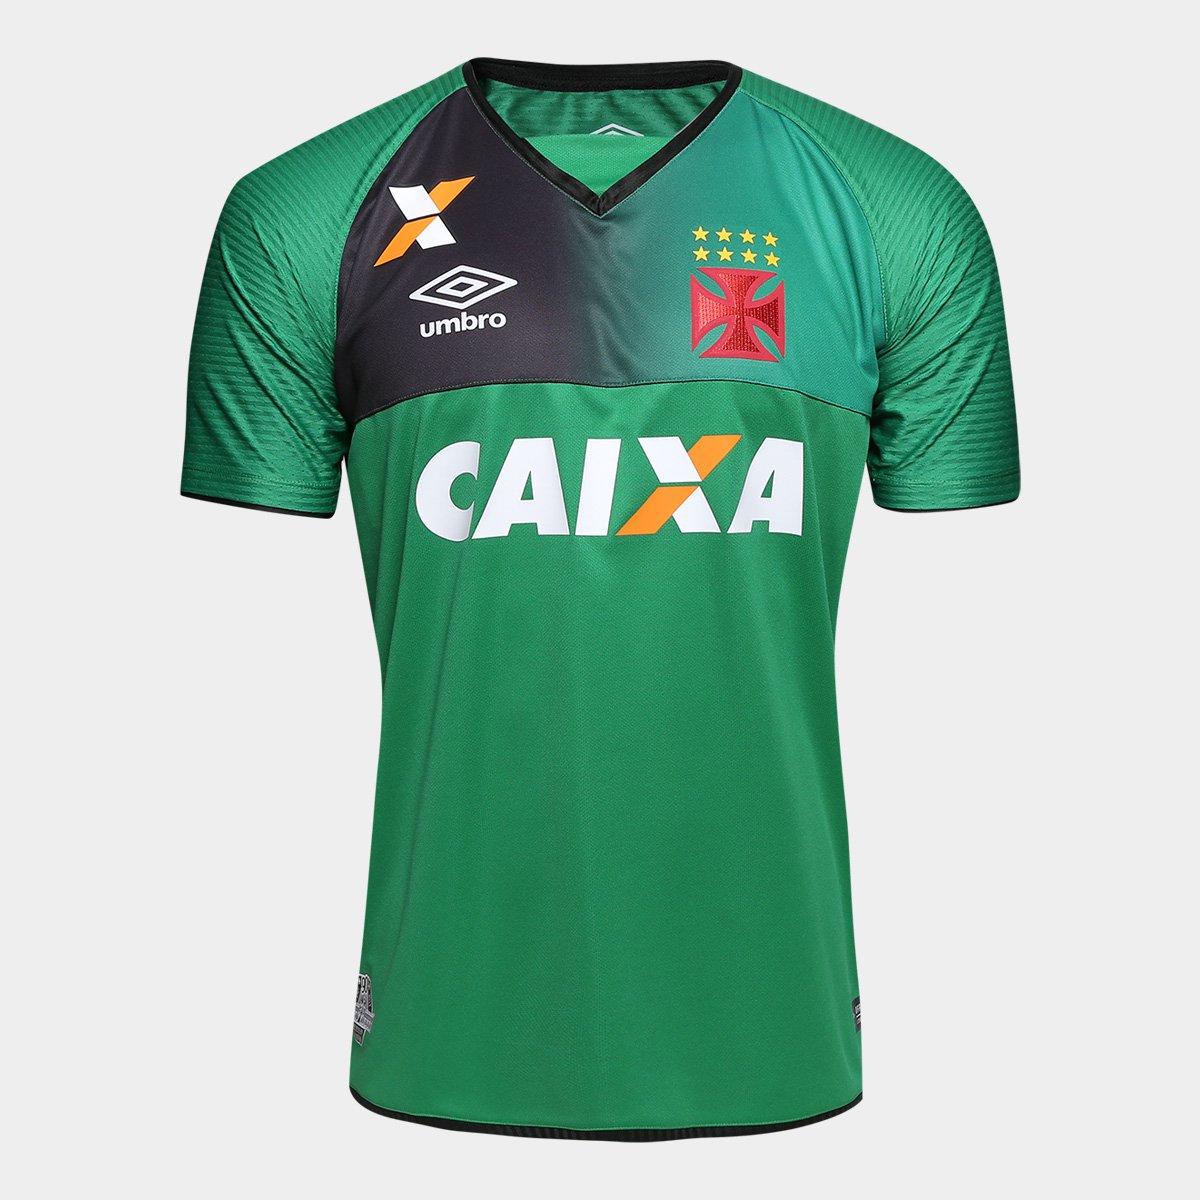 FornecedorNetshoes. Camisa Vasco Goleiro 17 18 s nº Torcedor Umbro Masculina 155ccdc269c59